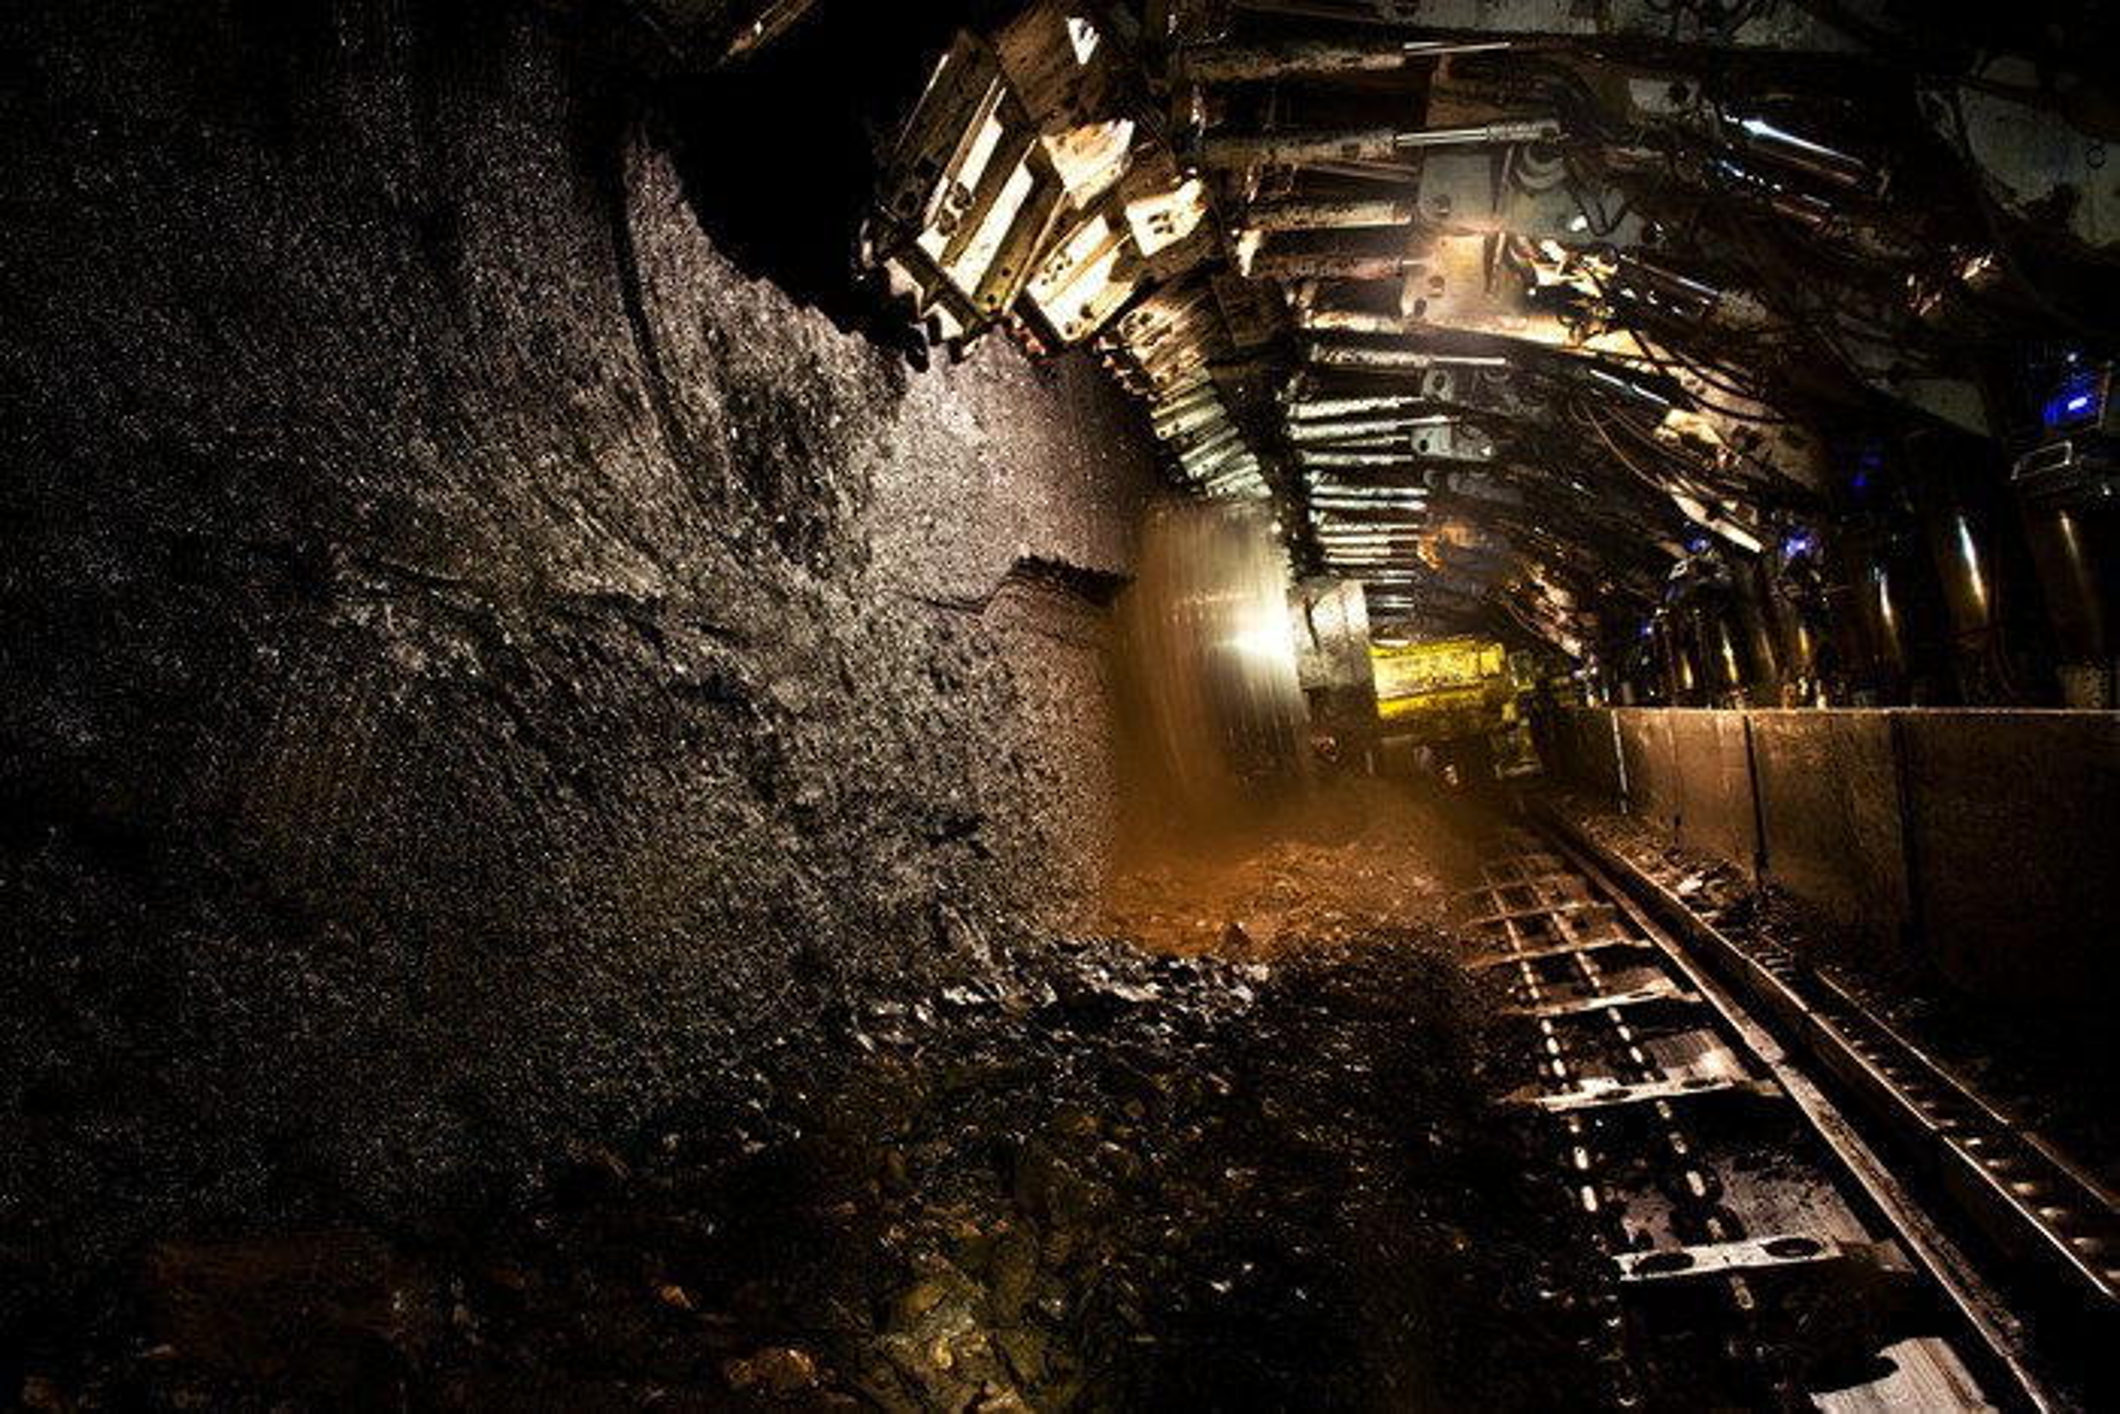 Underground coal mine tracks